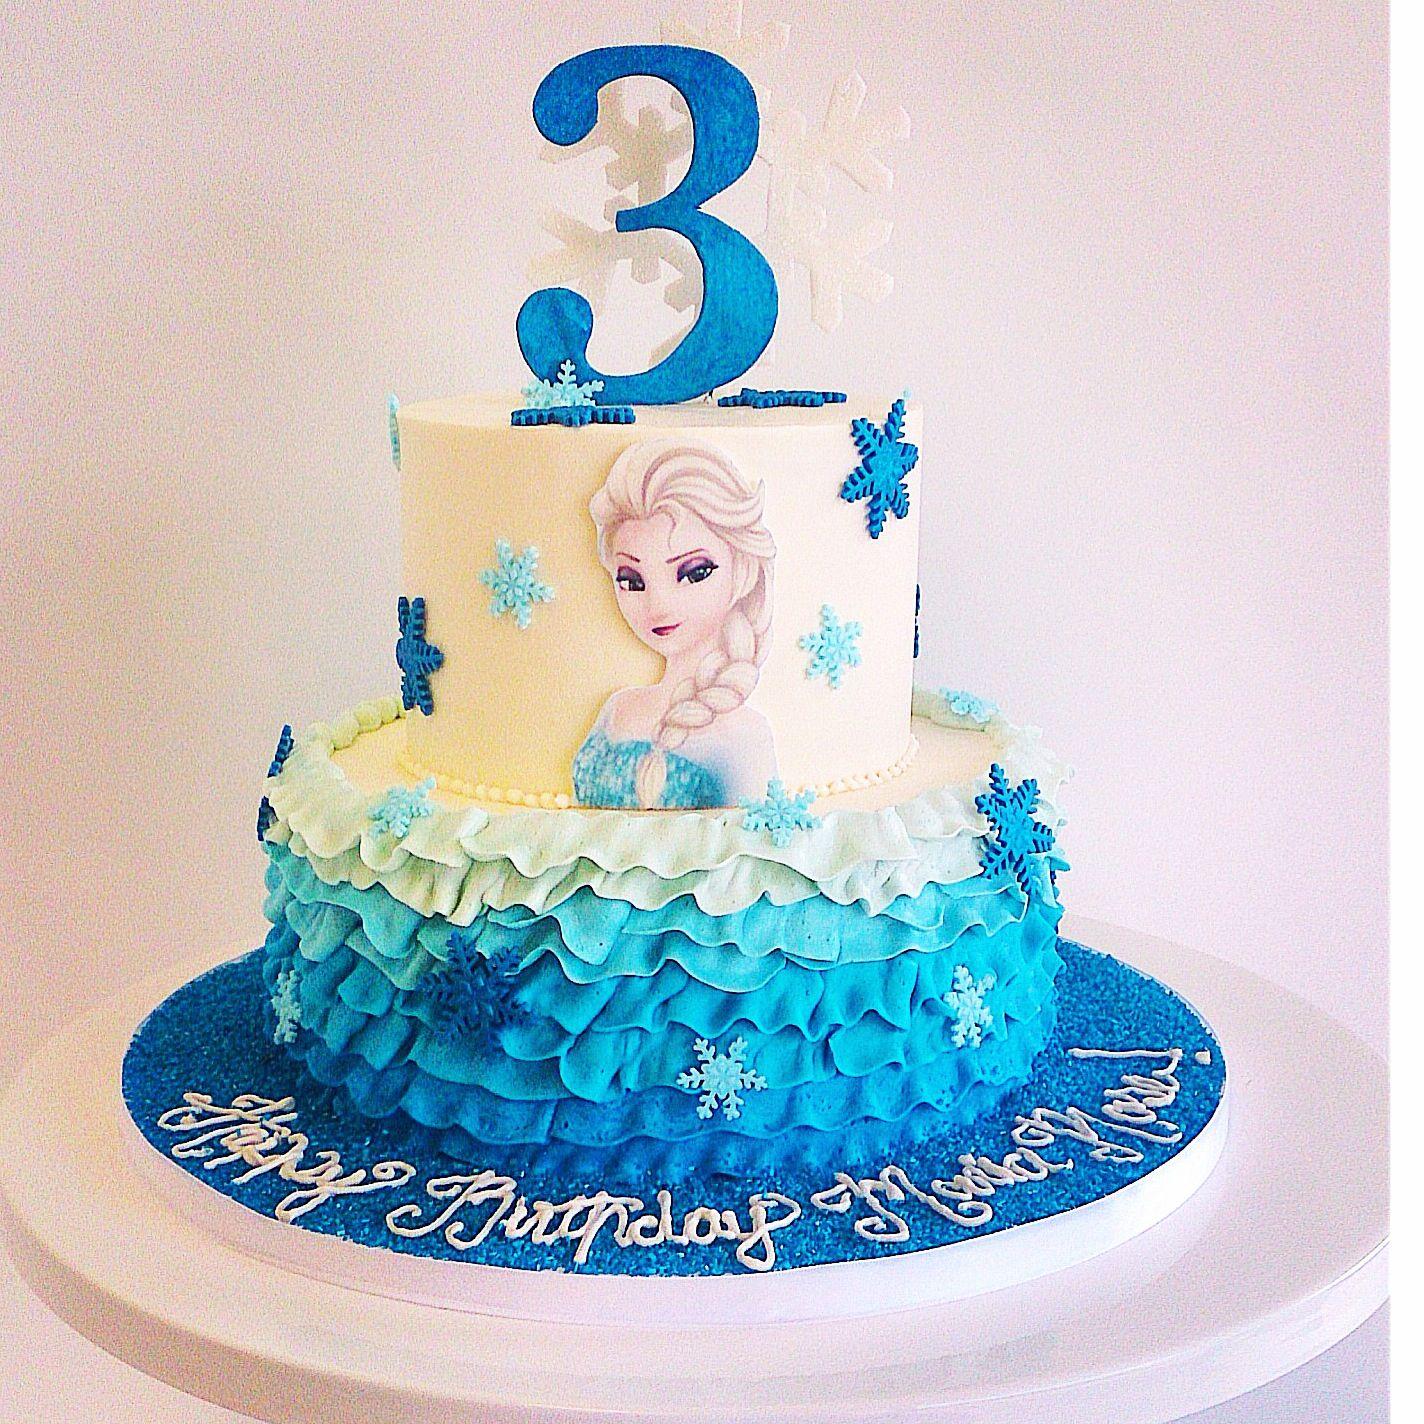 Remarkable 11 Birthday Cake For Kids Toddler Birthday Cakes Birthday Cake Funny Birthday Cards Online Alyptdamsfinfo